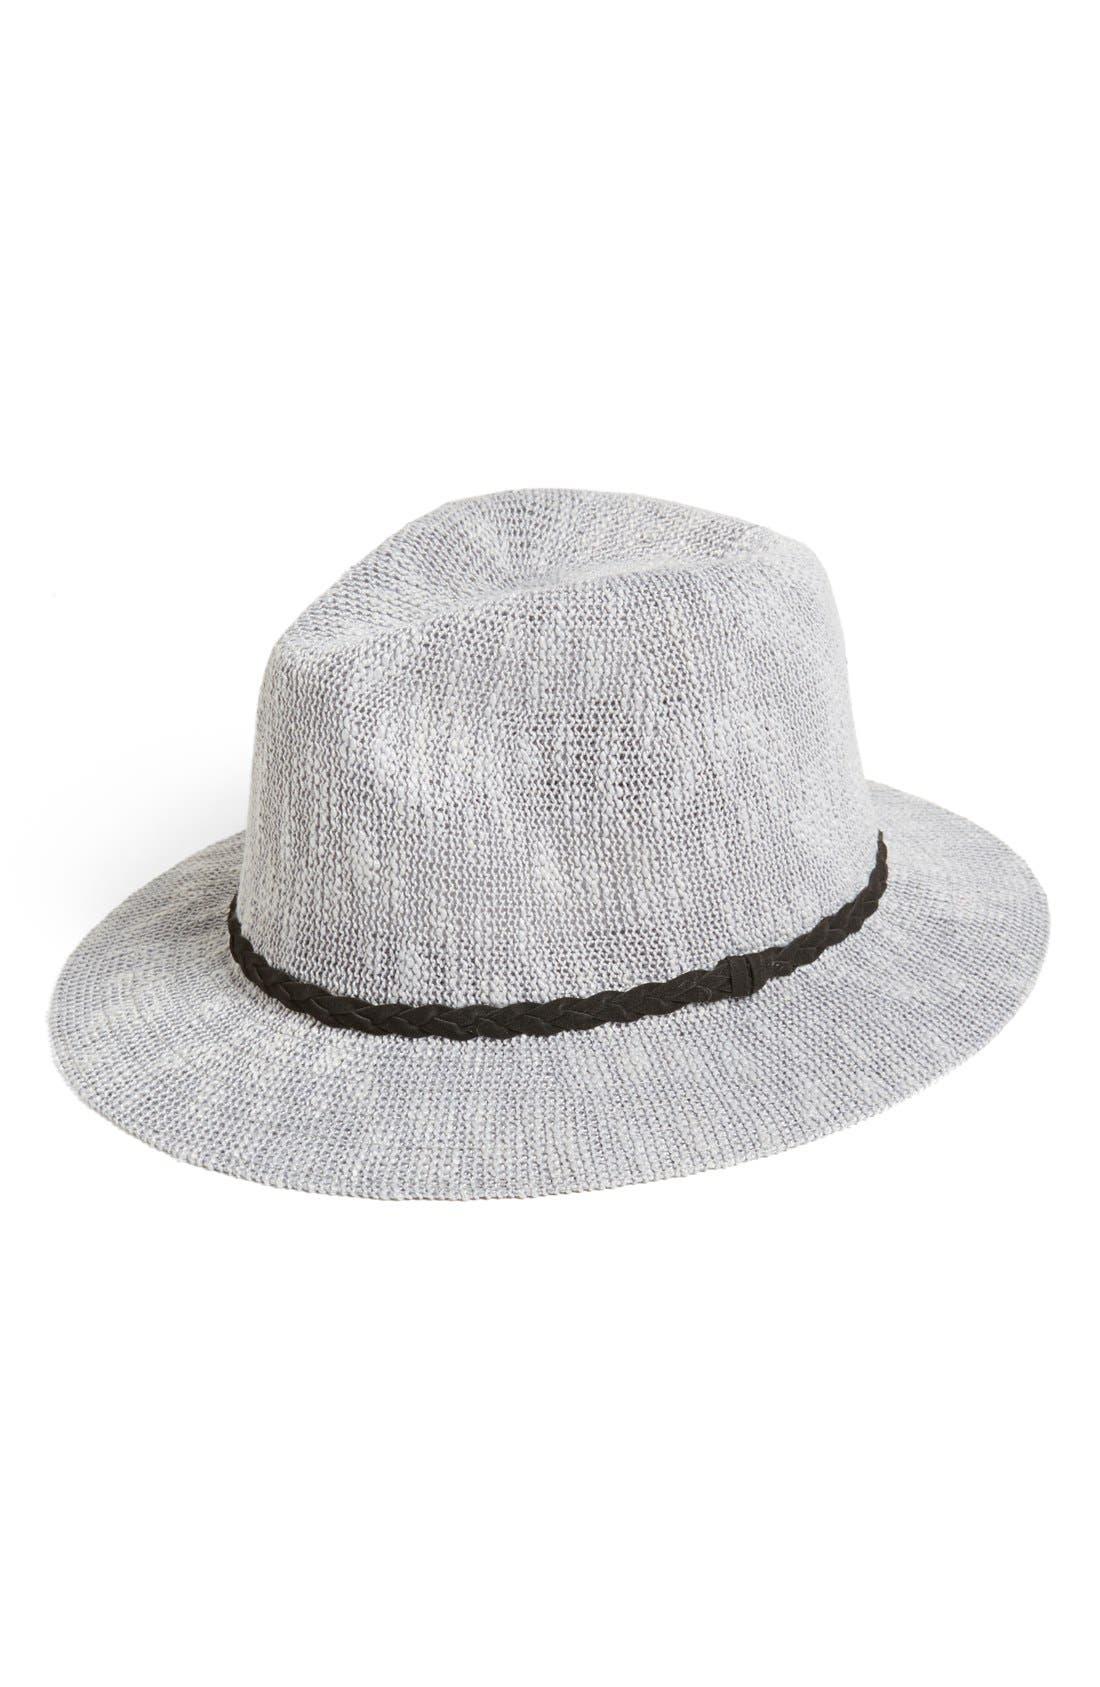 Alternate Image 1 Selected - BP. 'Panama' Slub Knit Fedora (Juniors) (Online Only)